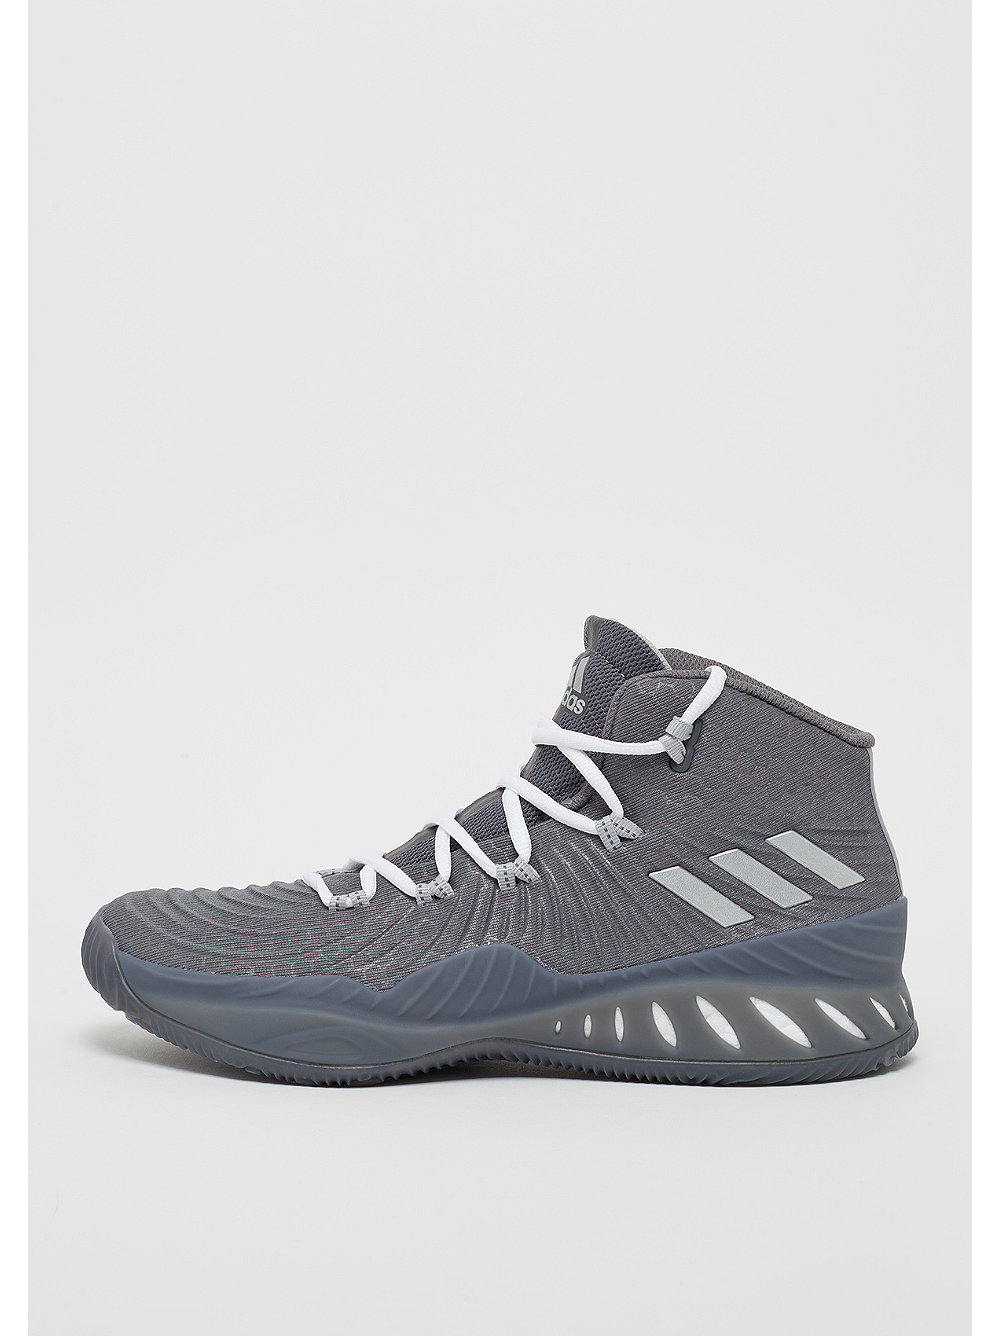 adidas Crazy Explosive 2017 grey four f17-silver metallic-grey two